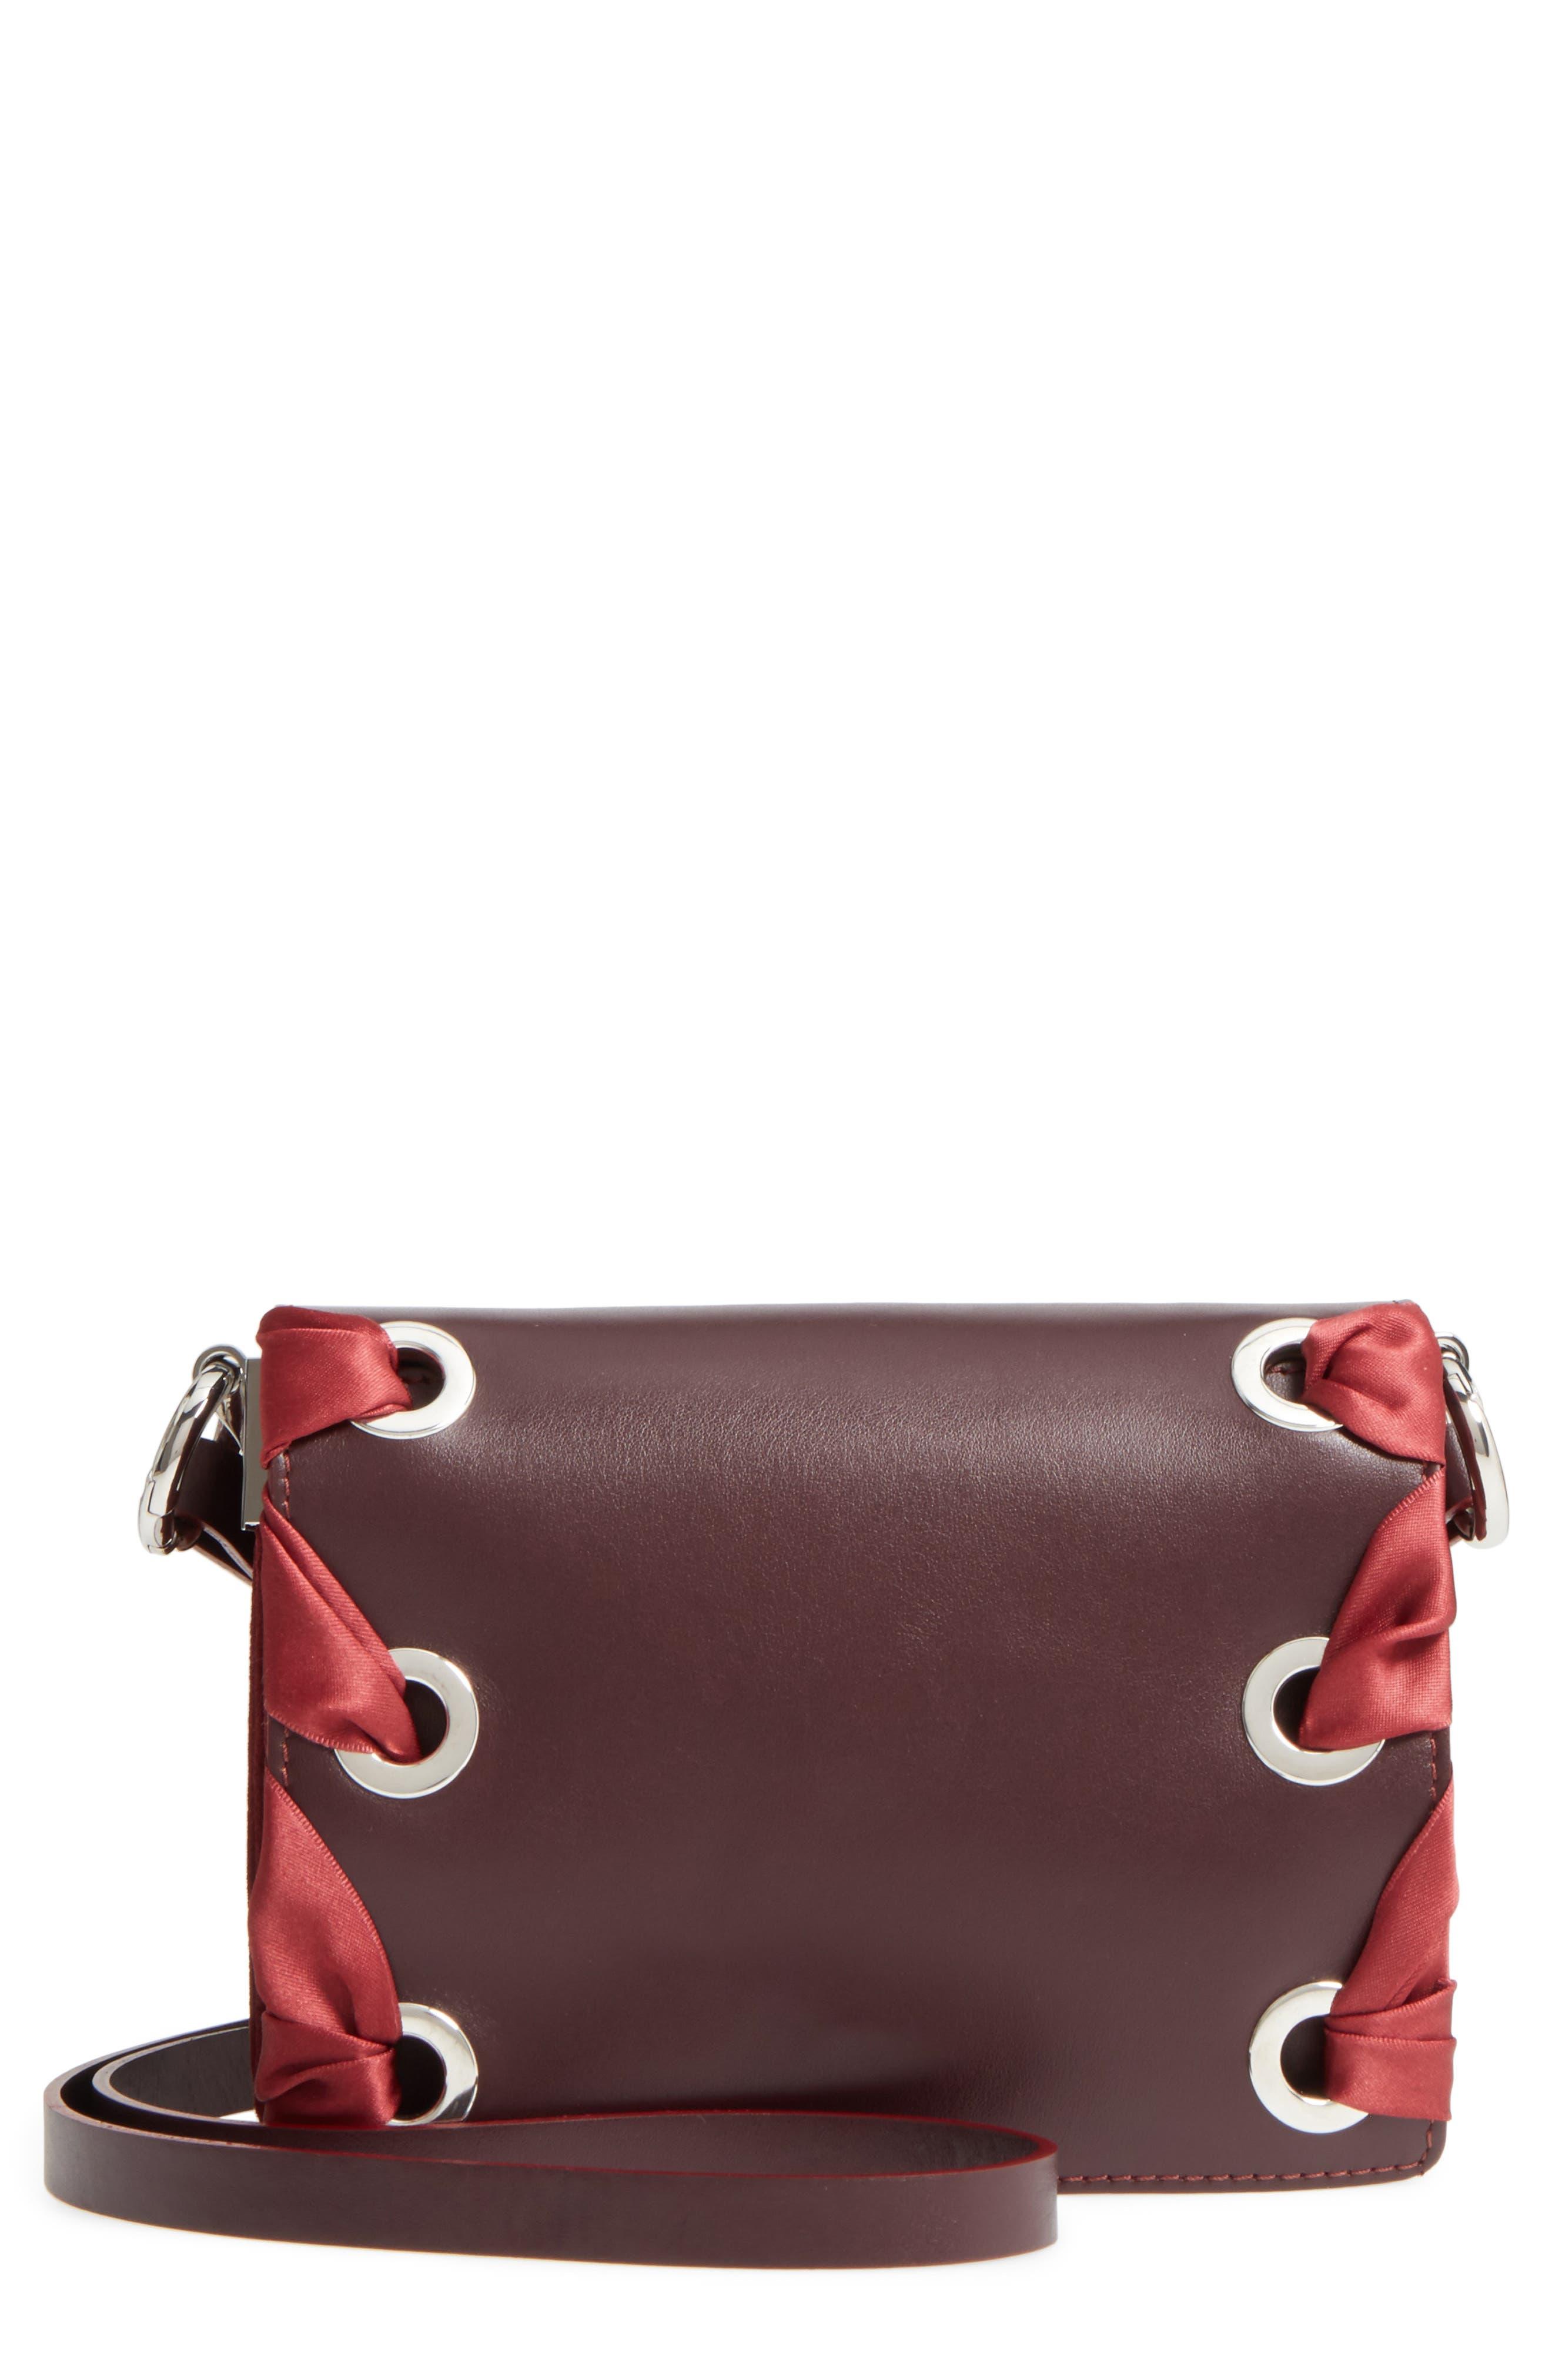 Main Image - Topshop Premium Leather Grace Crossbody Bag